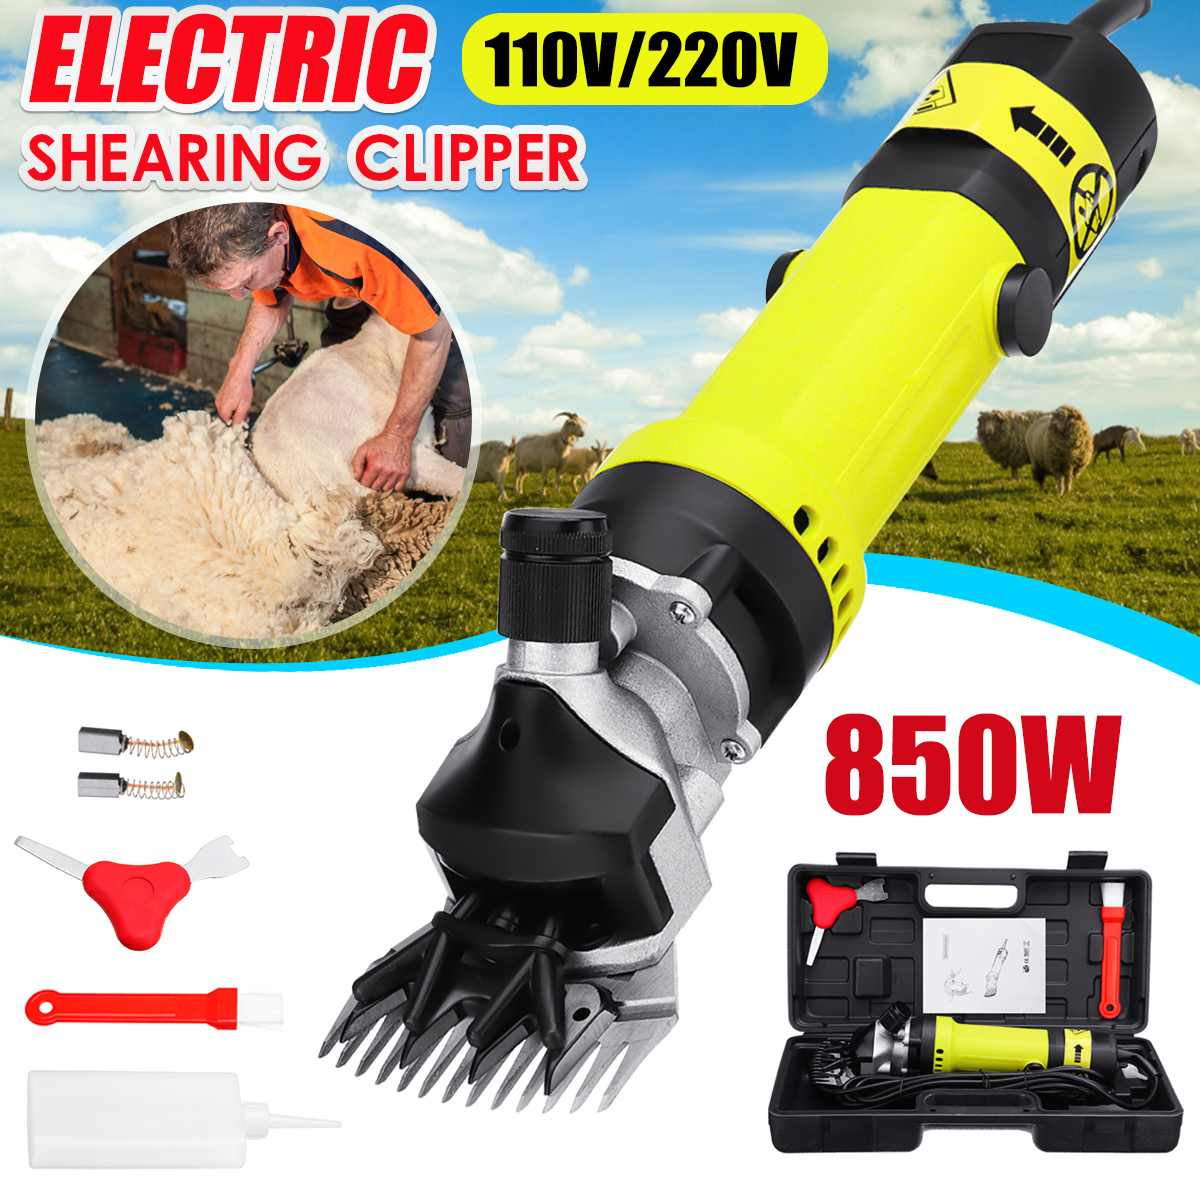 850W US/AU Plug Electric Sheep Dog Pet Hair Clipper Animal Shearing Supplies Goat Alpaca Farm Cut Machine w/Box Adjustable Speed